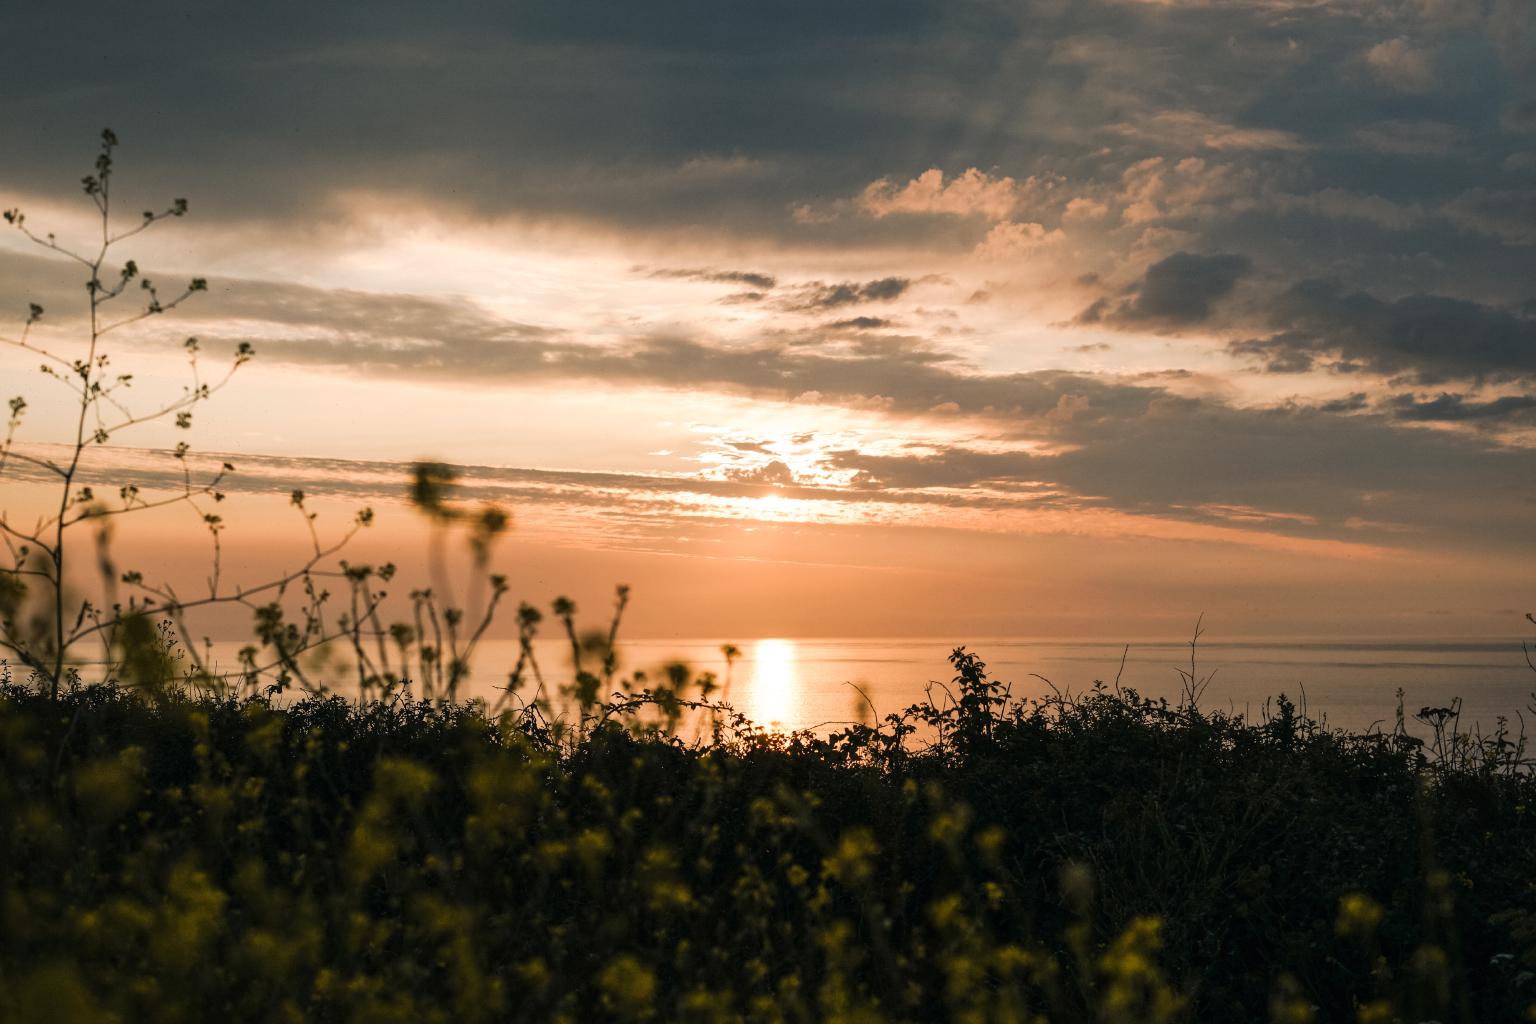 Cornwall_2019_10.jpg